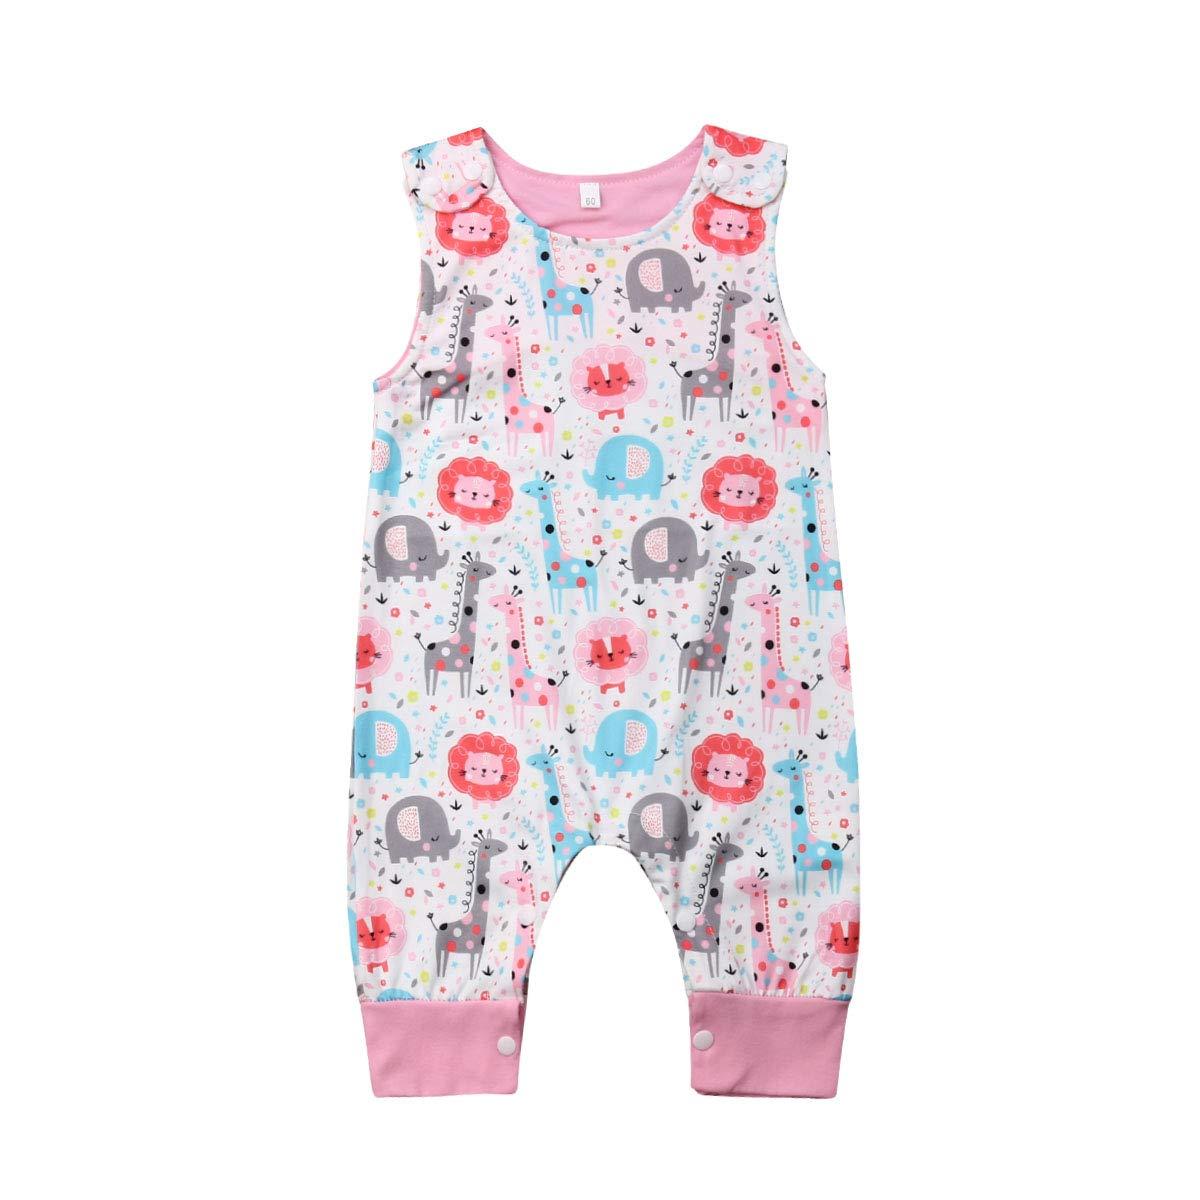 Newborn Baby Boys Girls Animal Dinosaur Romper One Piece Jumpsuits Sleeveless Summer Outfits